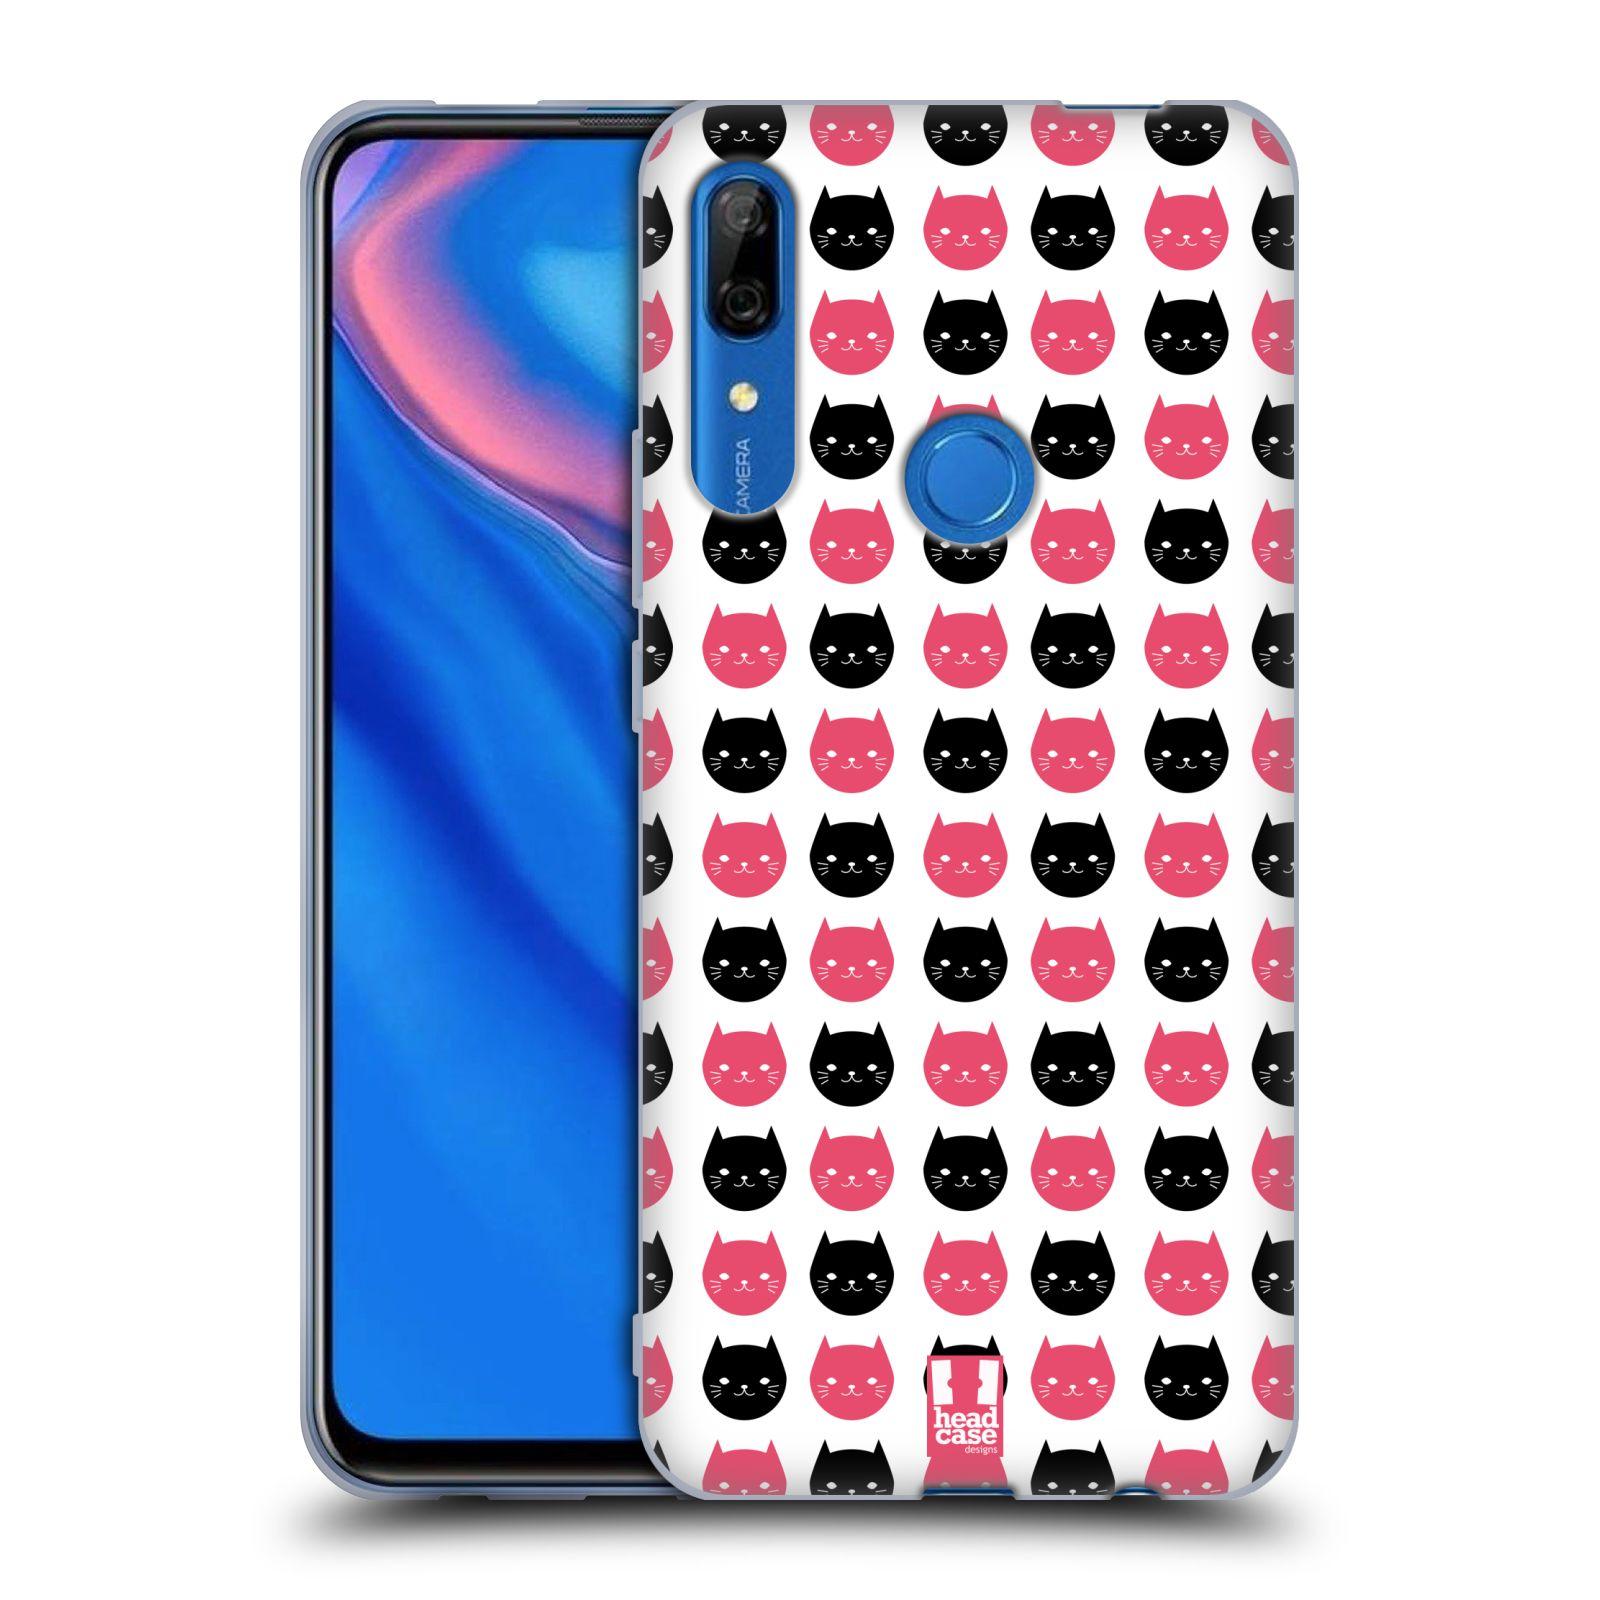 Silikonové pouzdro na mobil Huawei P Smart Z - Head Case - KOČKY Black and Pink